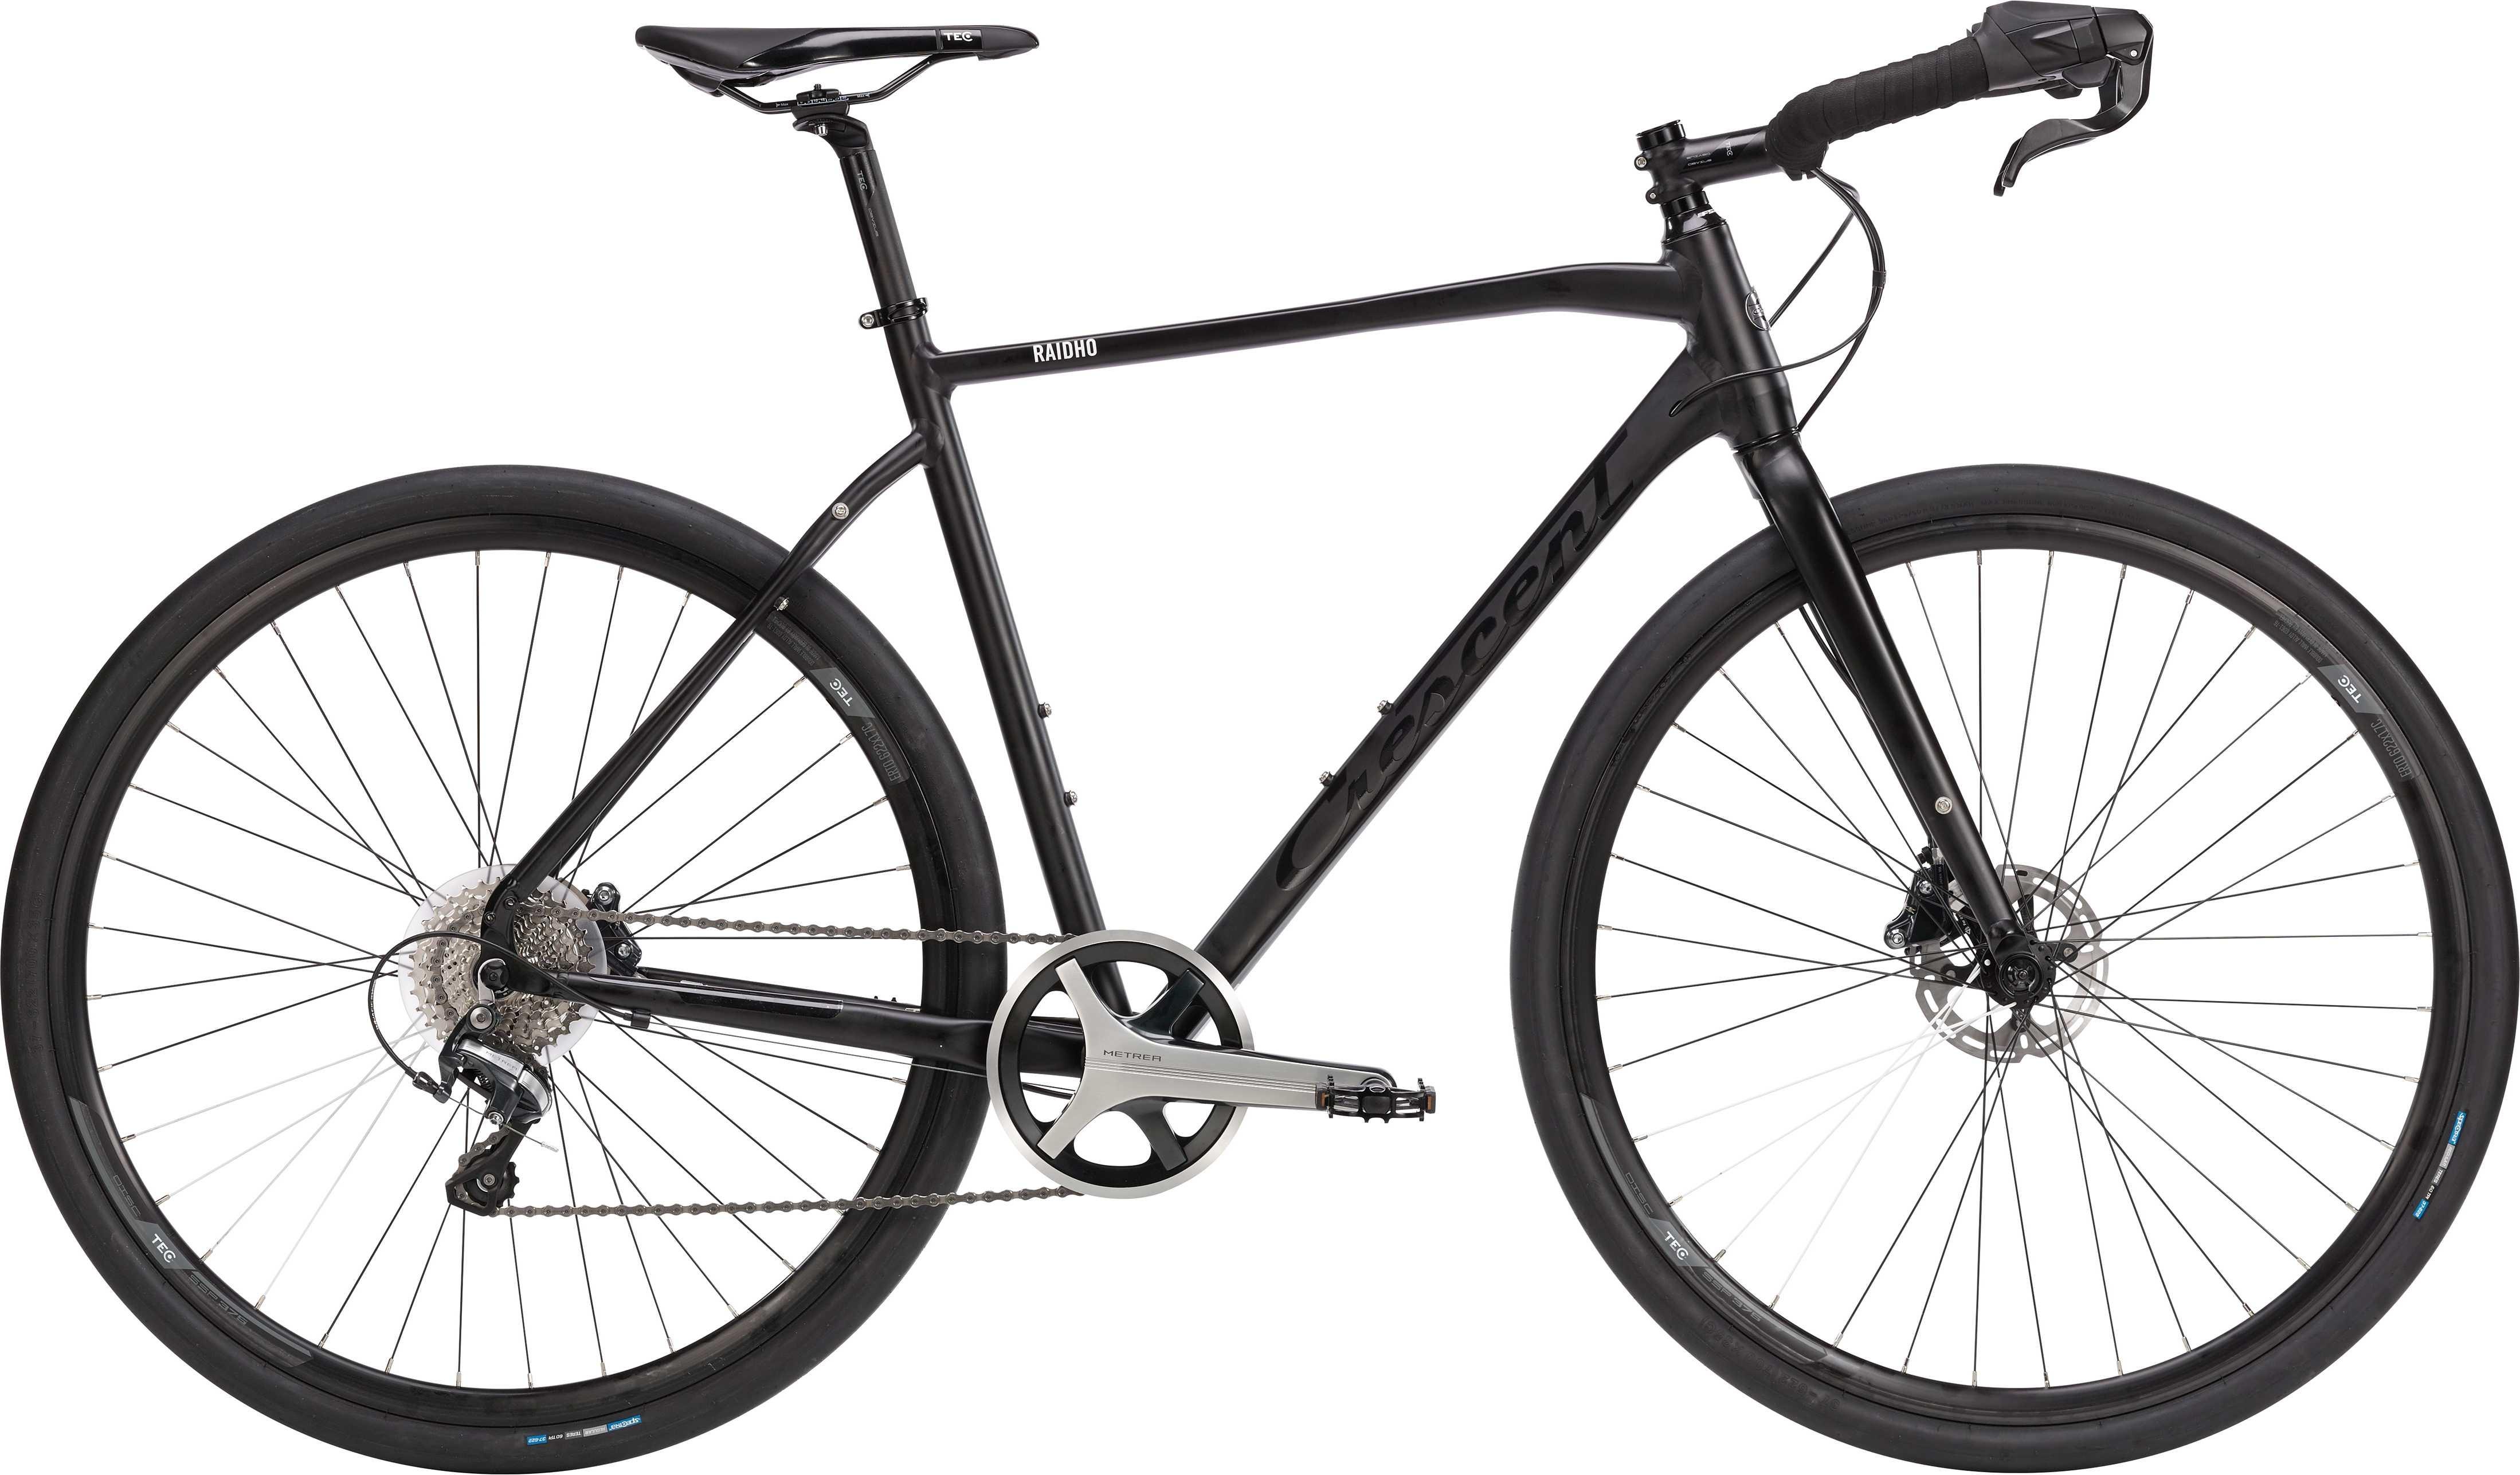 CRESCENT RAIDHO MATSORT | City-cykler